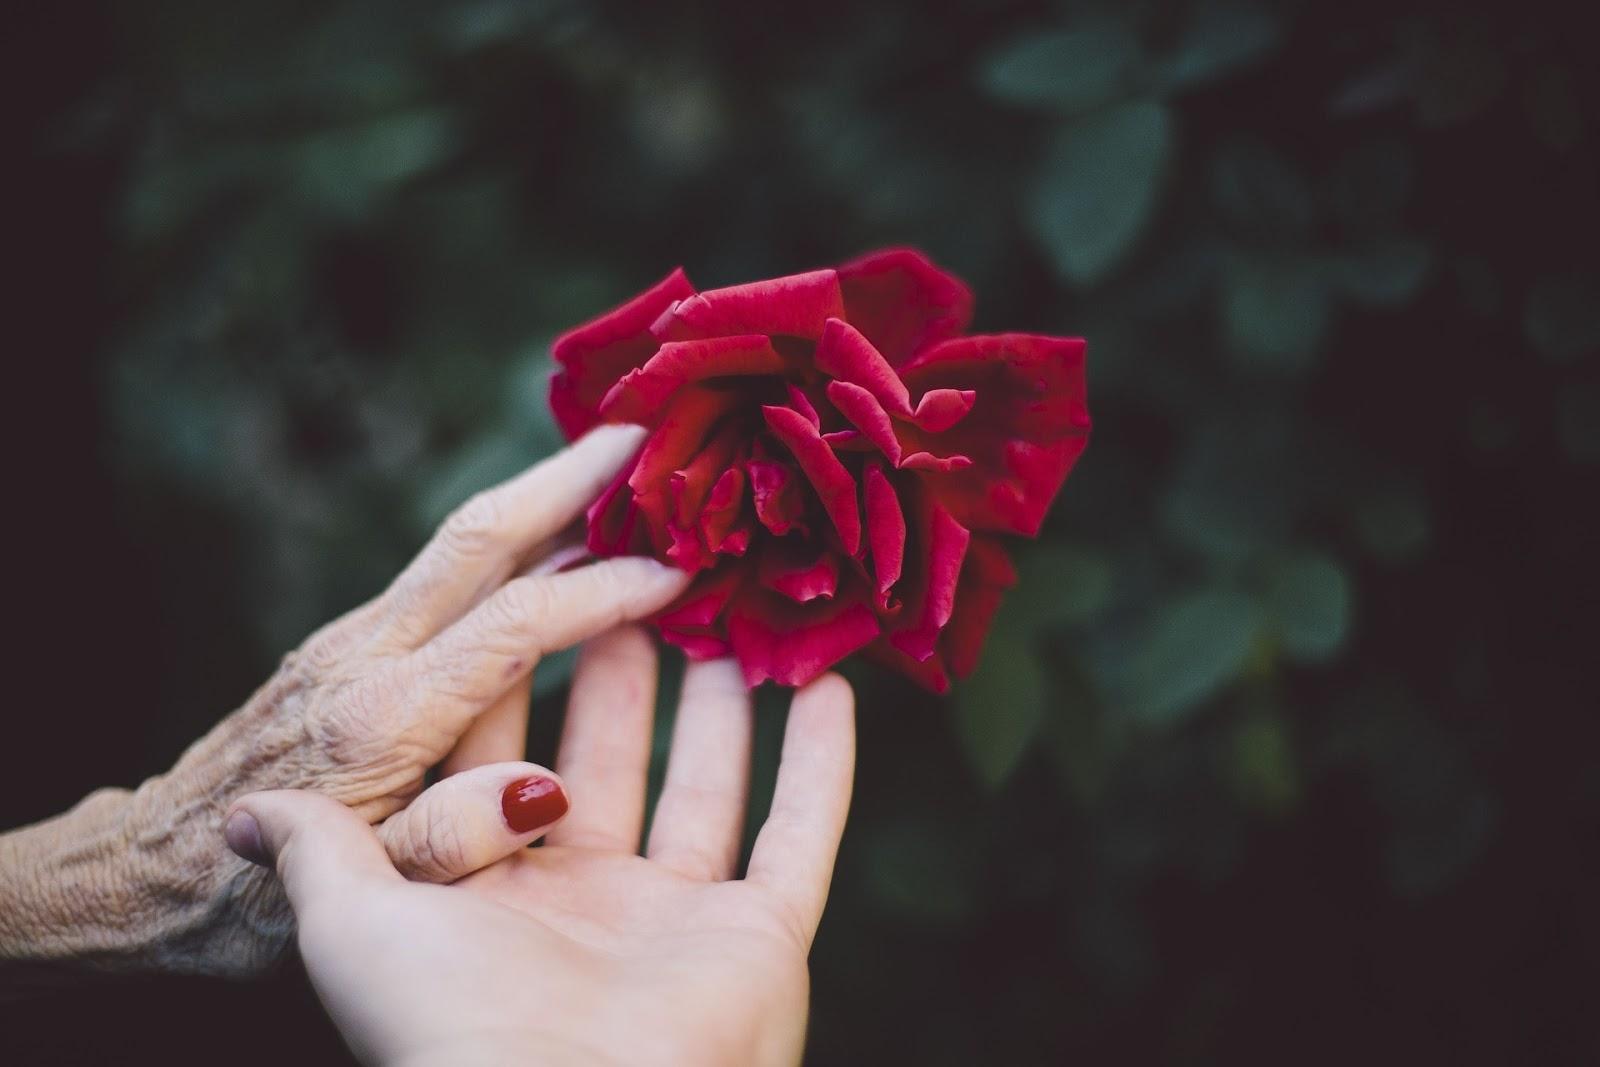 8 Gambar Bunga Mawar Merah Yang Sangat Cantik Gambar Indah